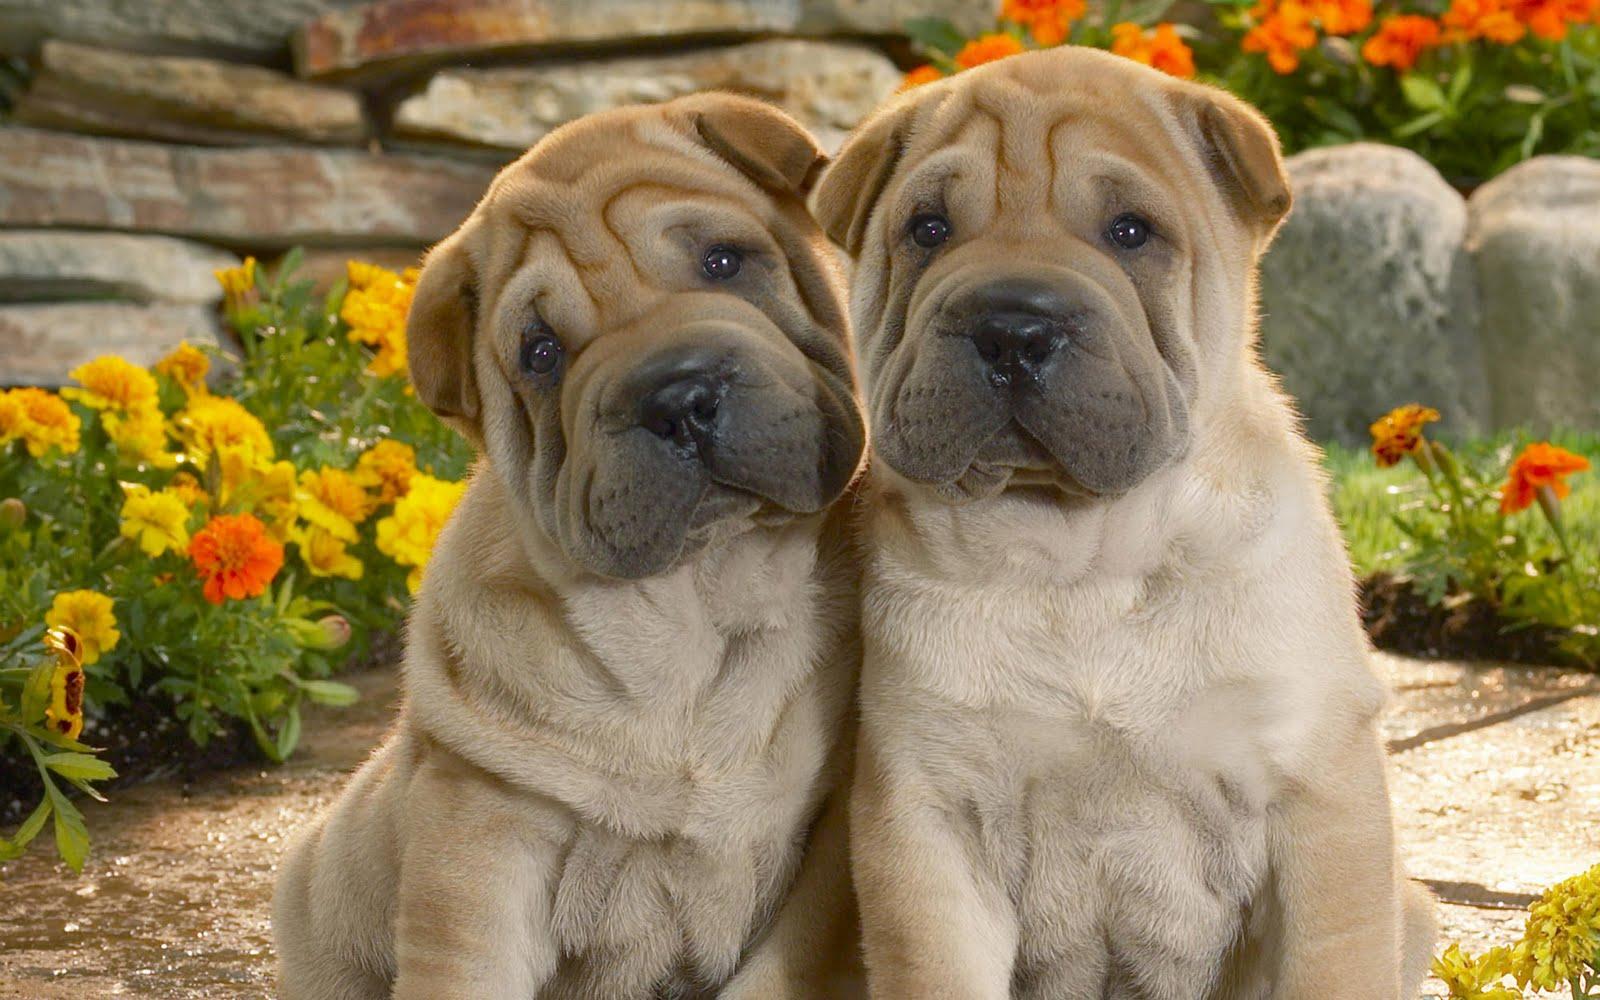 Funny Wallpapers Of Dogs Wallpapersafari